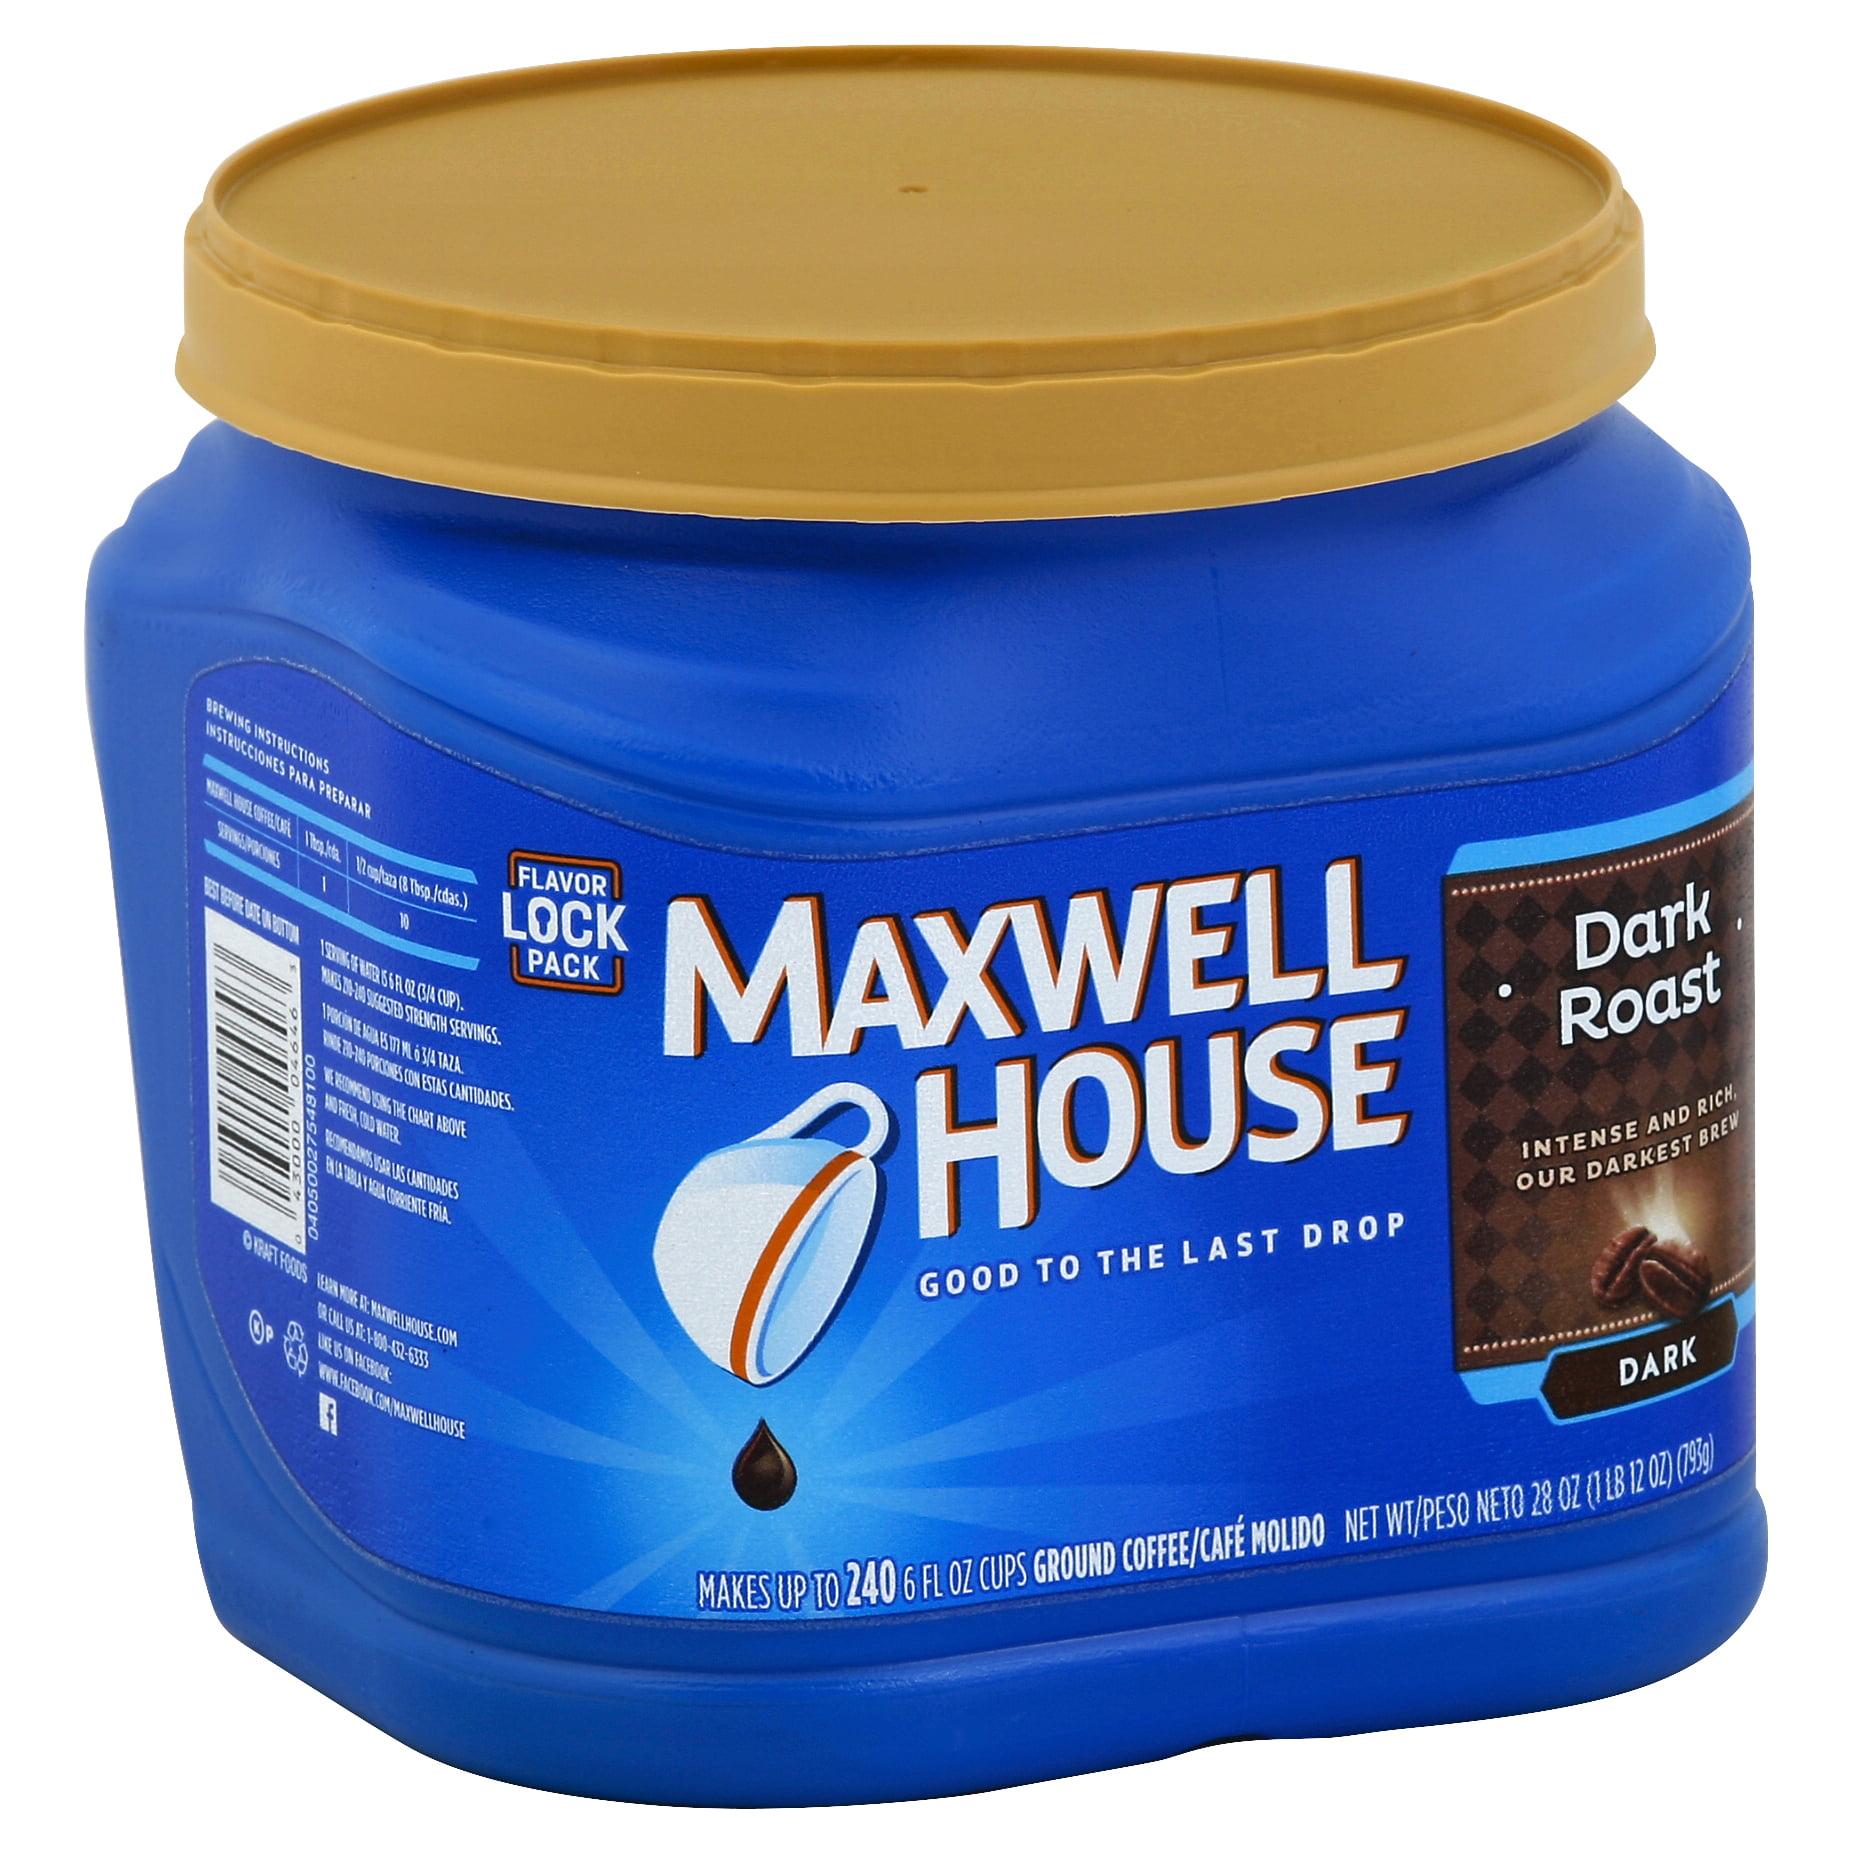 Maxwell House Dark Roast Ground Coffee, 28 oz